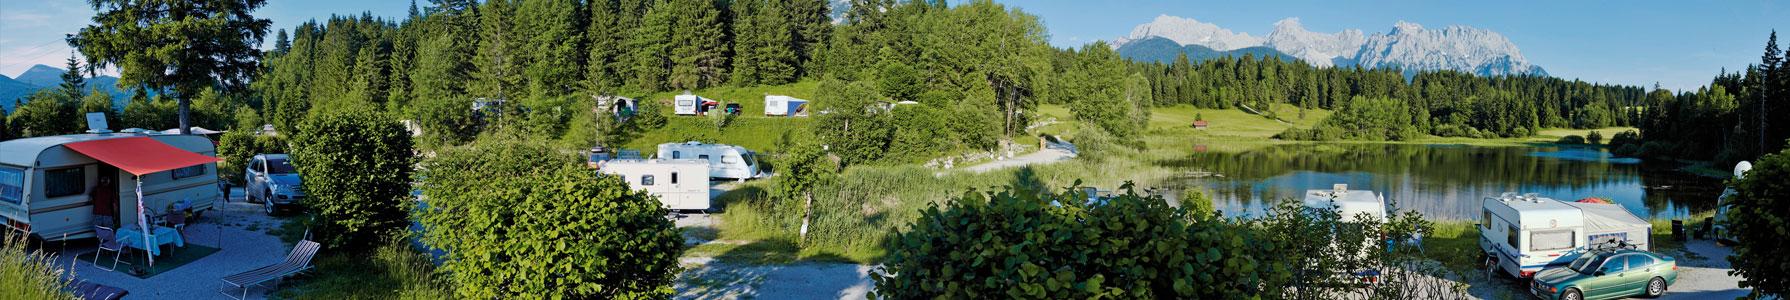 Alpen-Caravanpark Tennsee Preis Platz Bayern